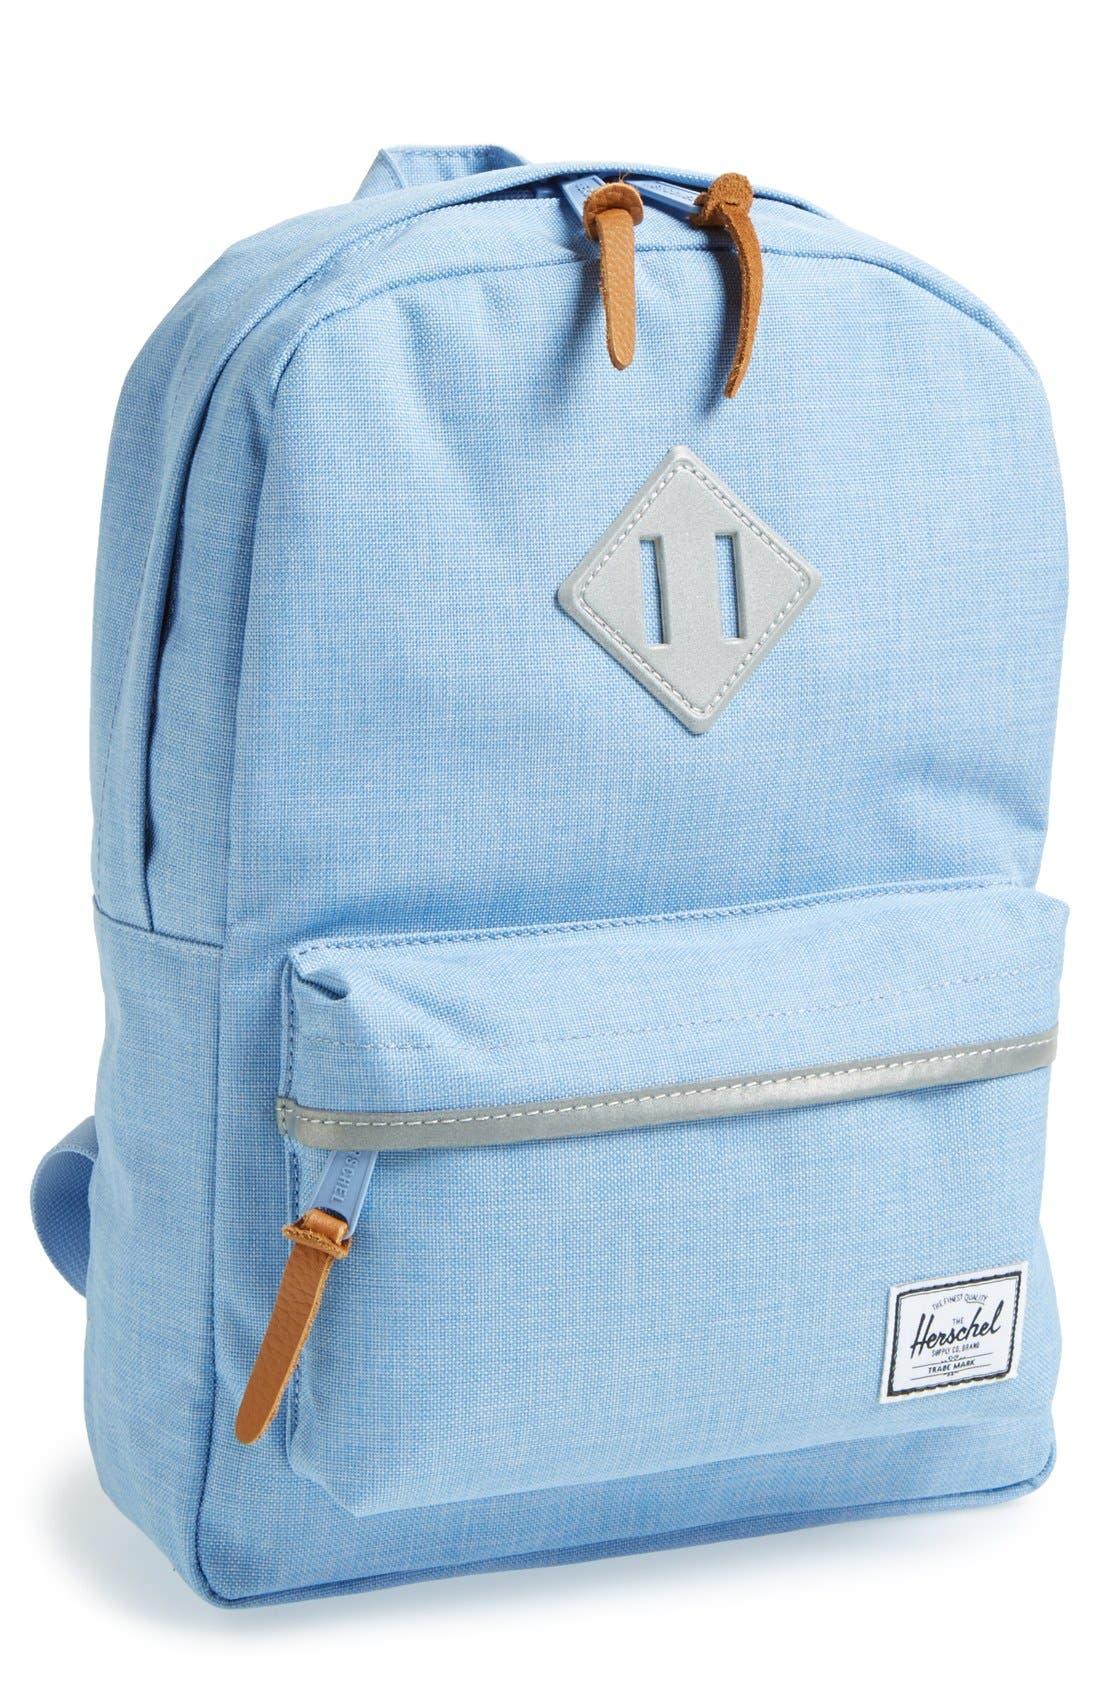 Alternate Image 1 Selected - Herschel Supply Co. 'Heritage - Camo' Backpack (Kids)